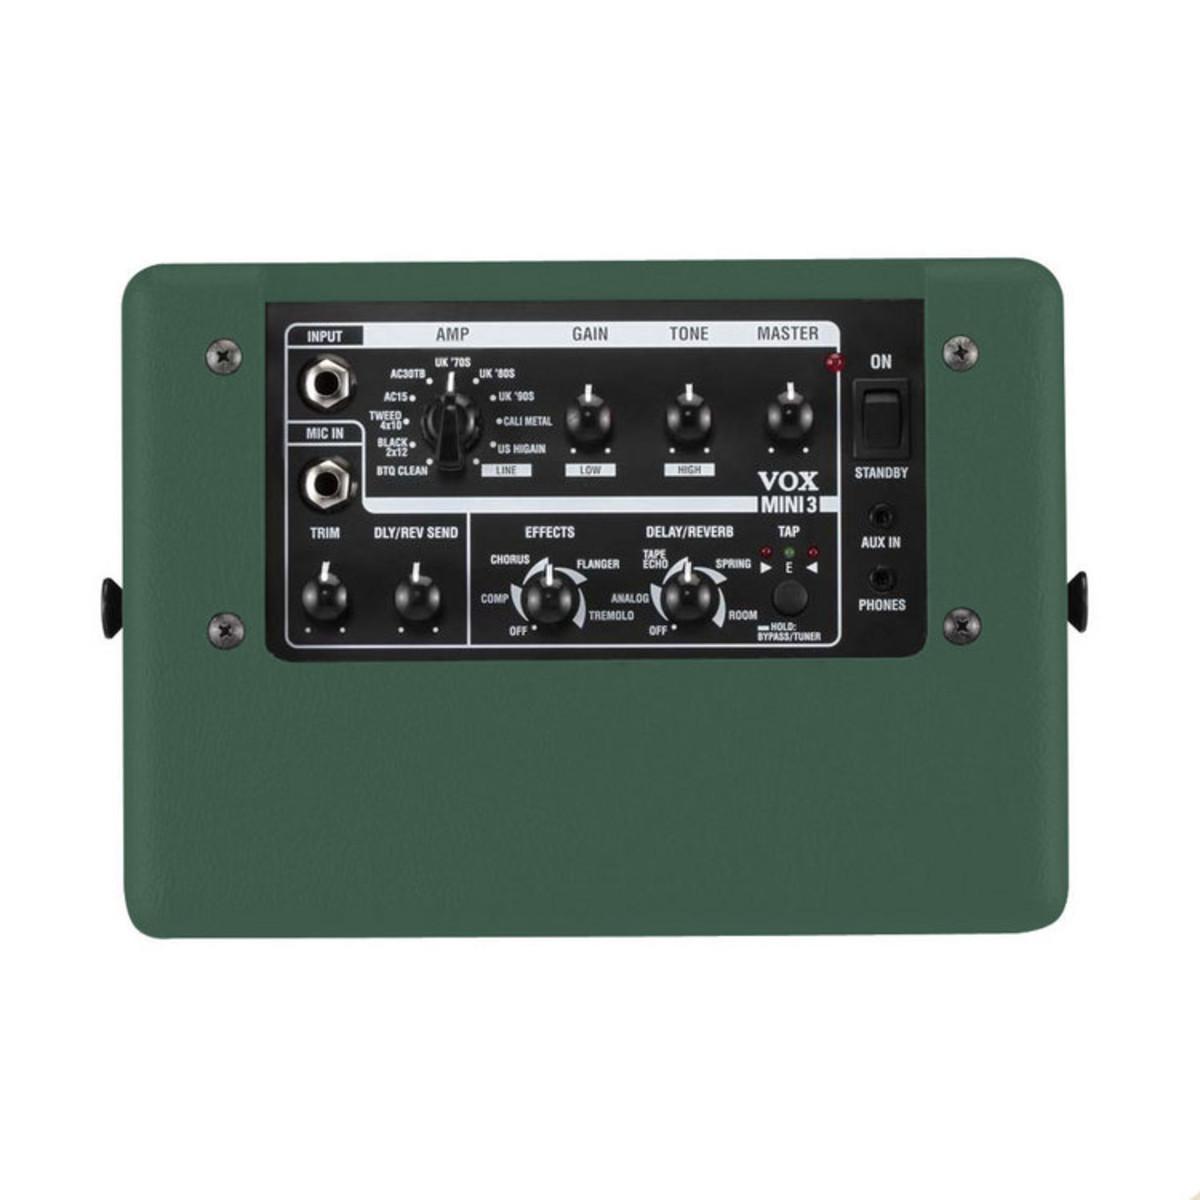 disc vox mini3 modelling guitar amp british racing green at gear4music. Black Bedroom Furniture Sets. Home Design Ideas